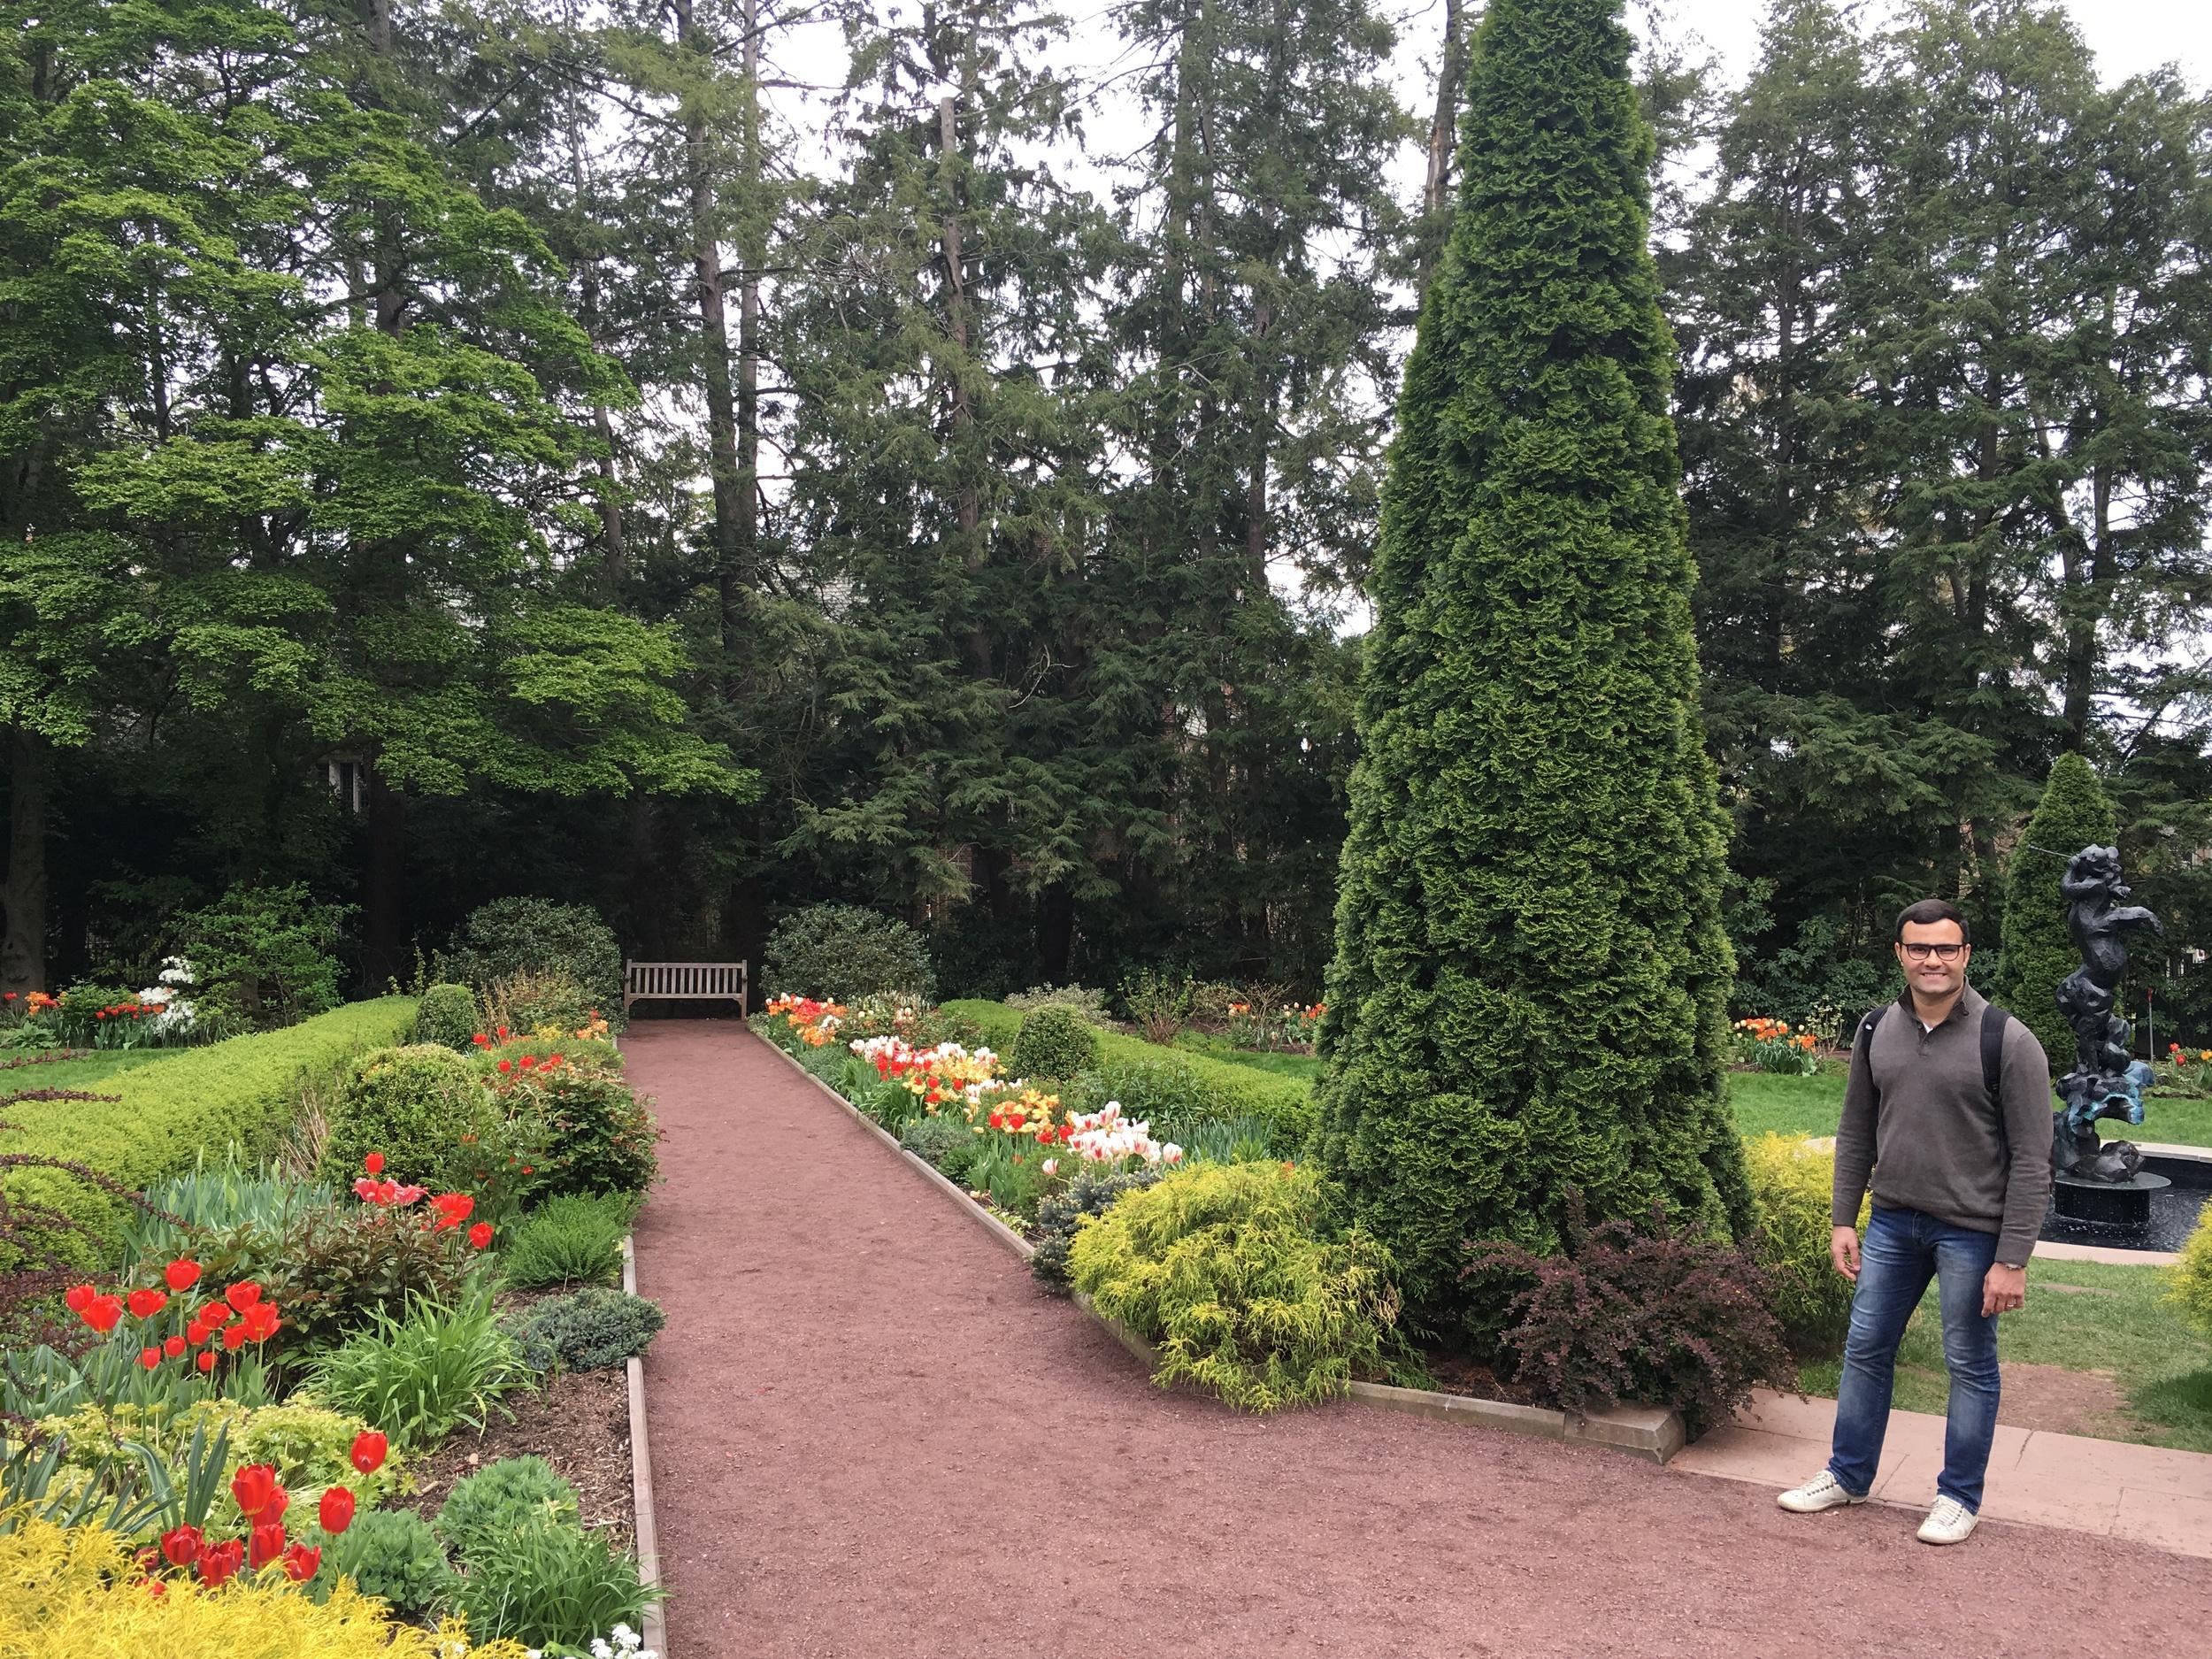 Prospect Garden, which was once President Woodrow Wilson's backyard.